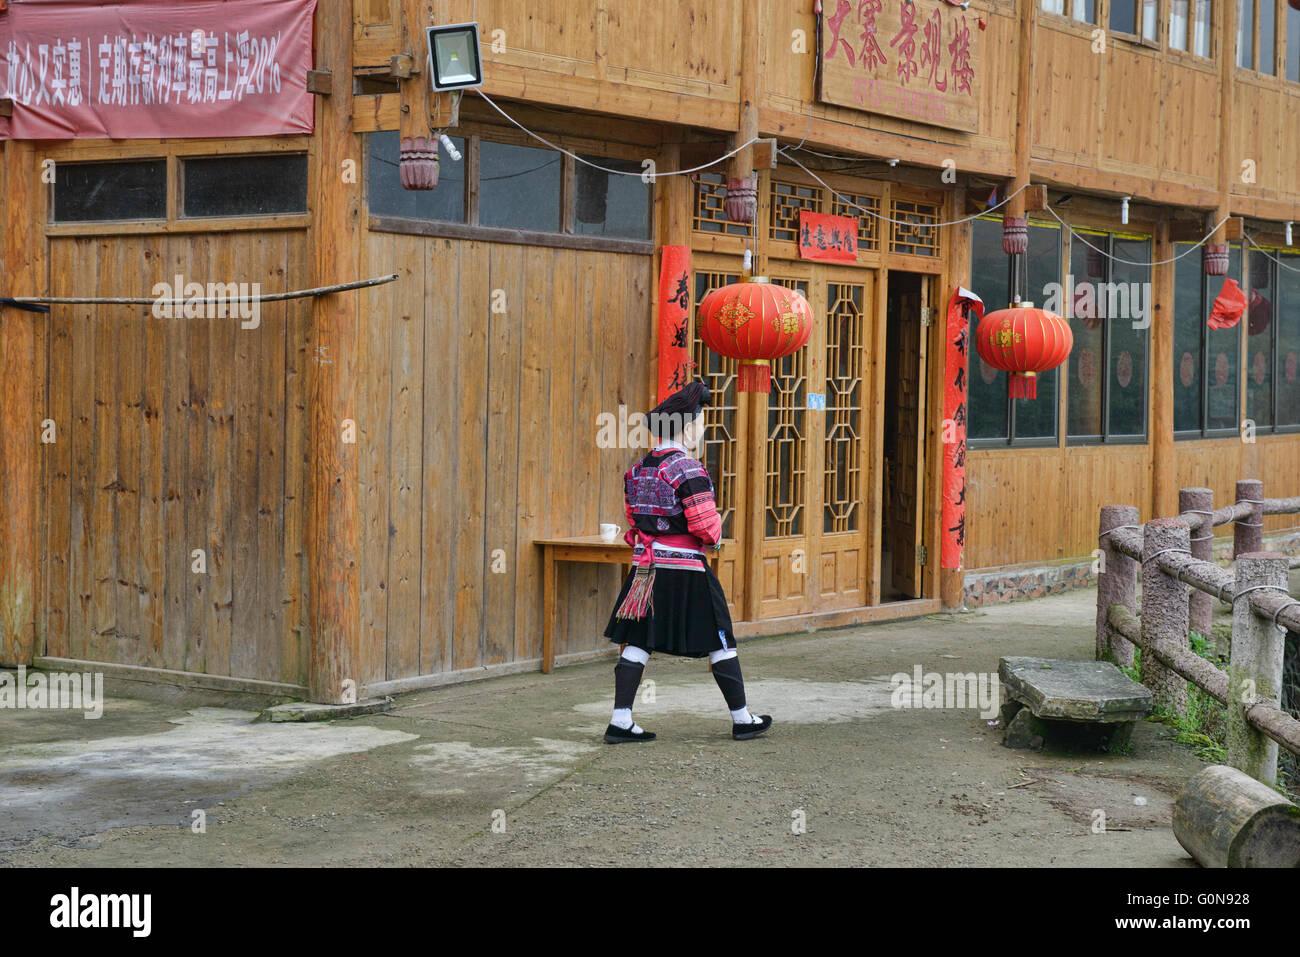 Traditional Yao lodge and house, Dazhai, Guangxi Autonomous Region, China - Stock Image